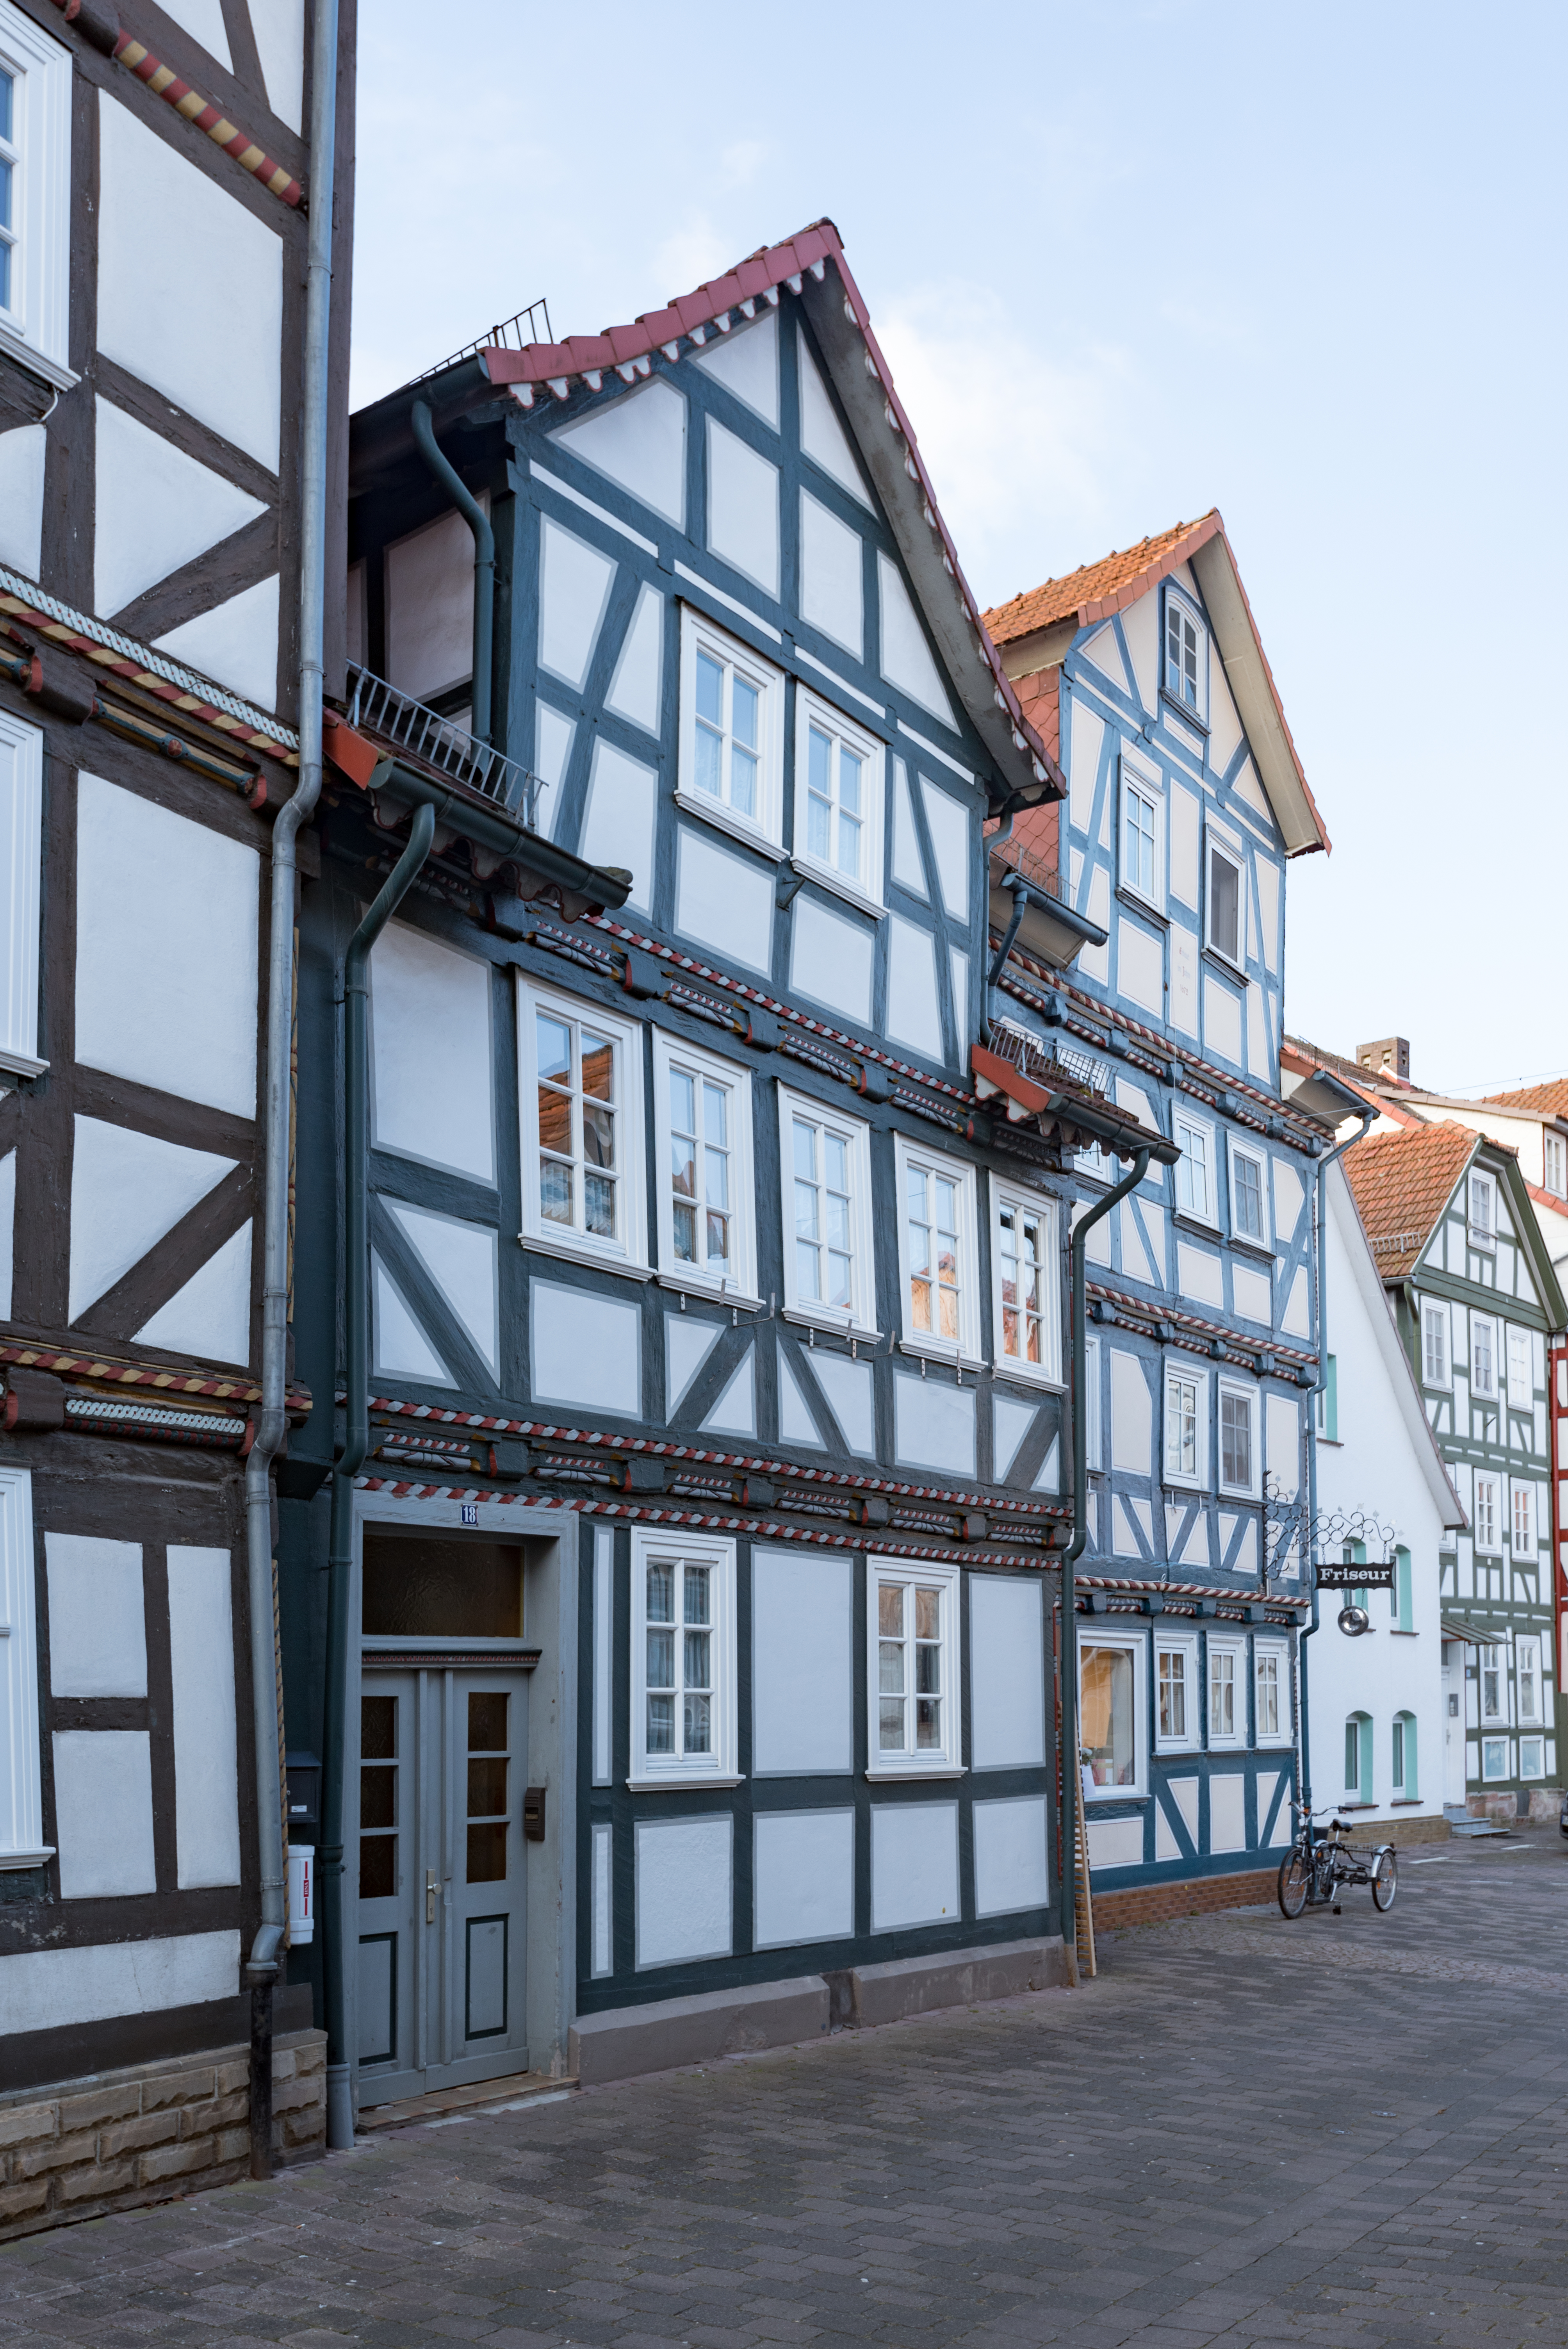 Dateibrotgasse 18 Rotenburg An Der Fulda 20180223 001jpg Wikipedia